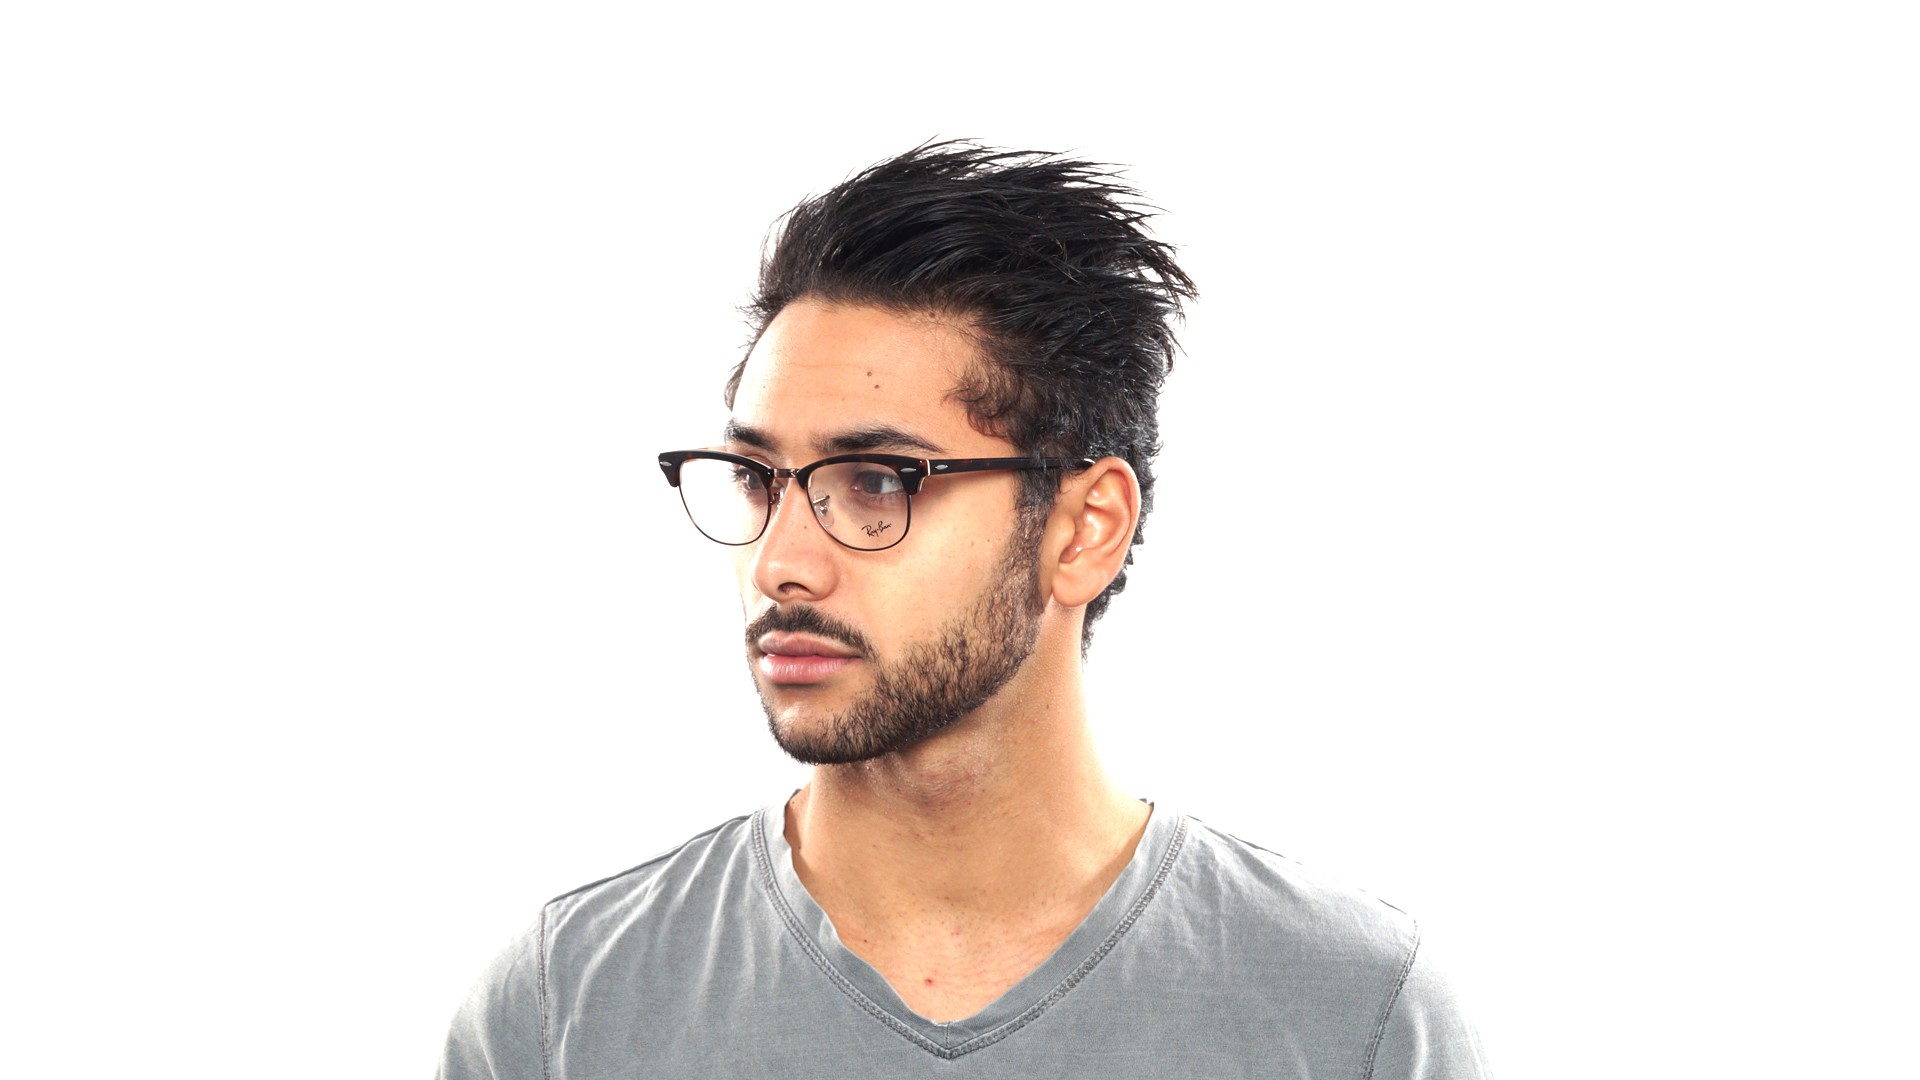 fdaf4d1a5ab ... eyeglasses photograph ec04d bb40c cheap lunettes de vue ray ban  clubmaster tortoise rx5154 rb5154 5650 51 21 visiofactory 8554b bed35 ...